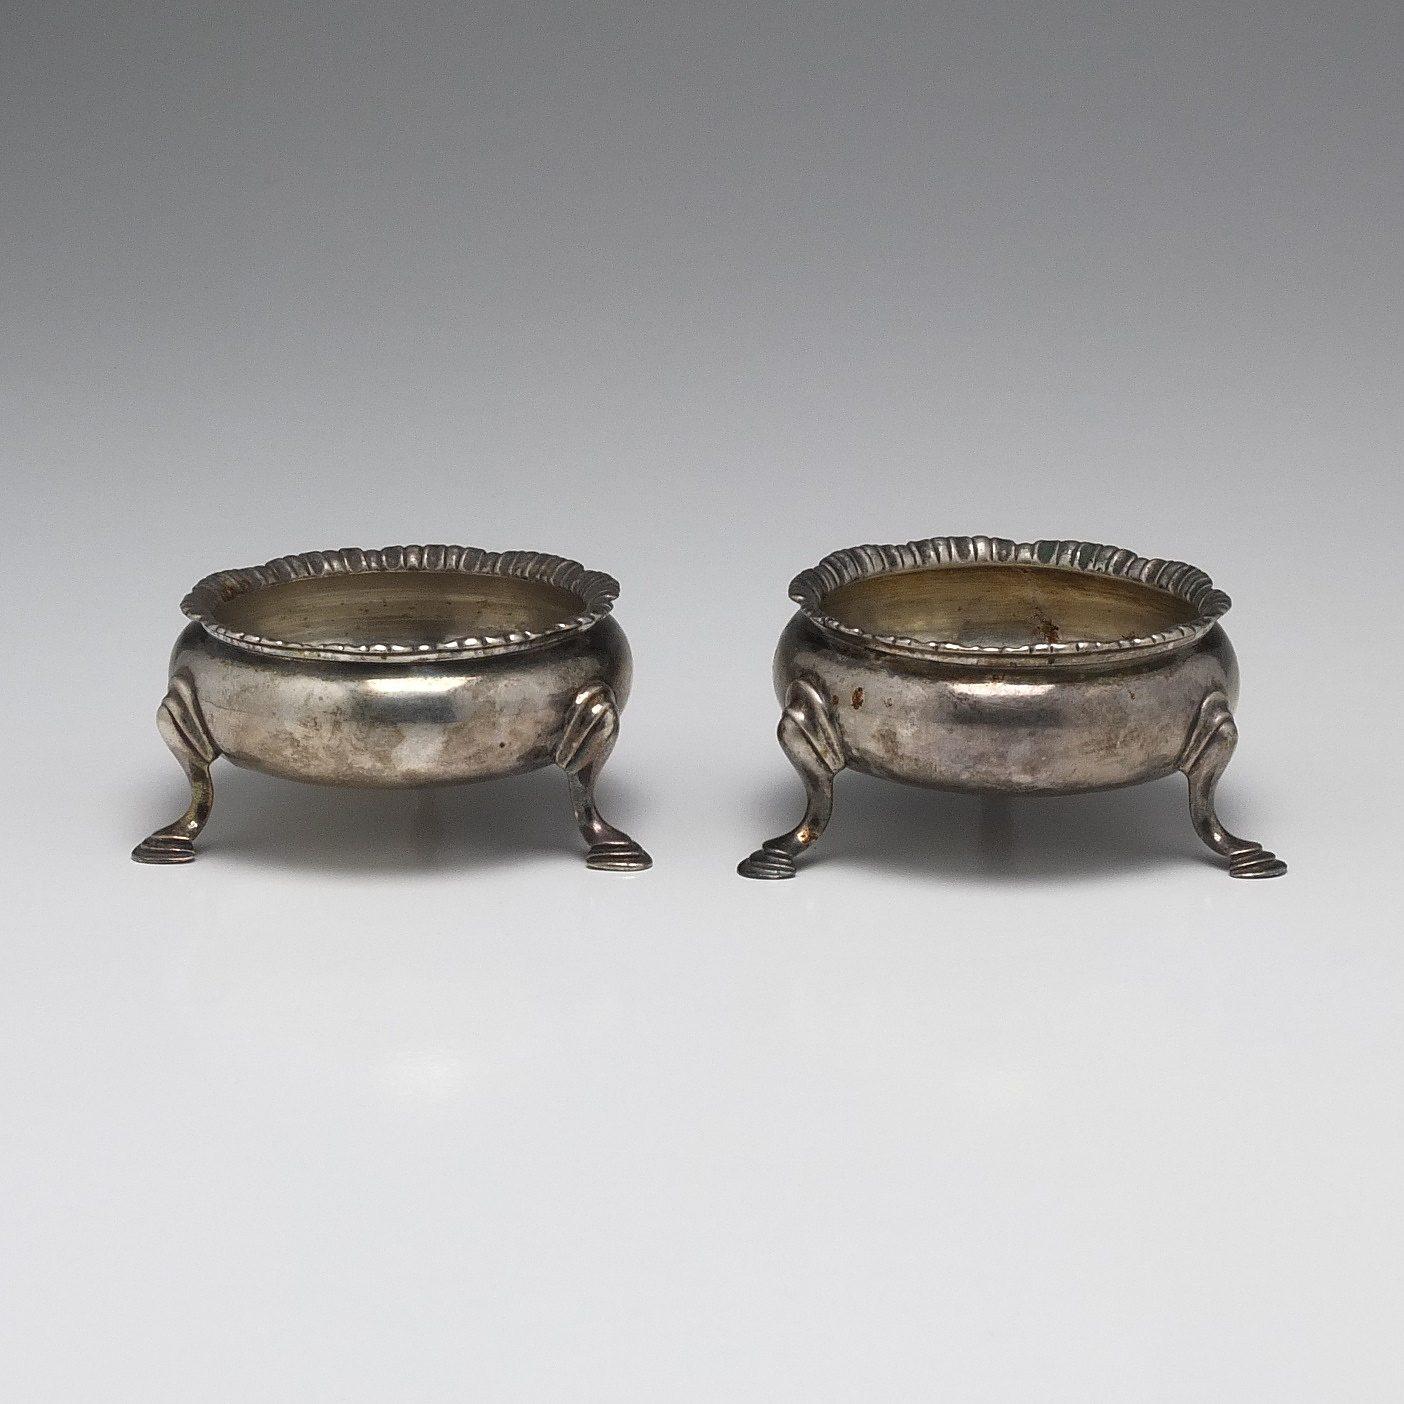 'Pair of George III Sterling Silver Open Salts John Muns London 1762'